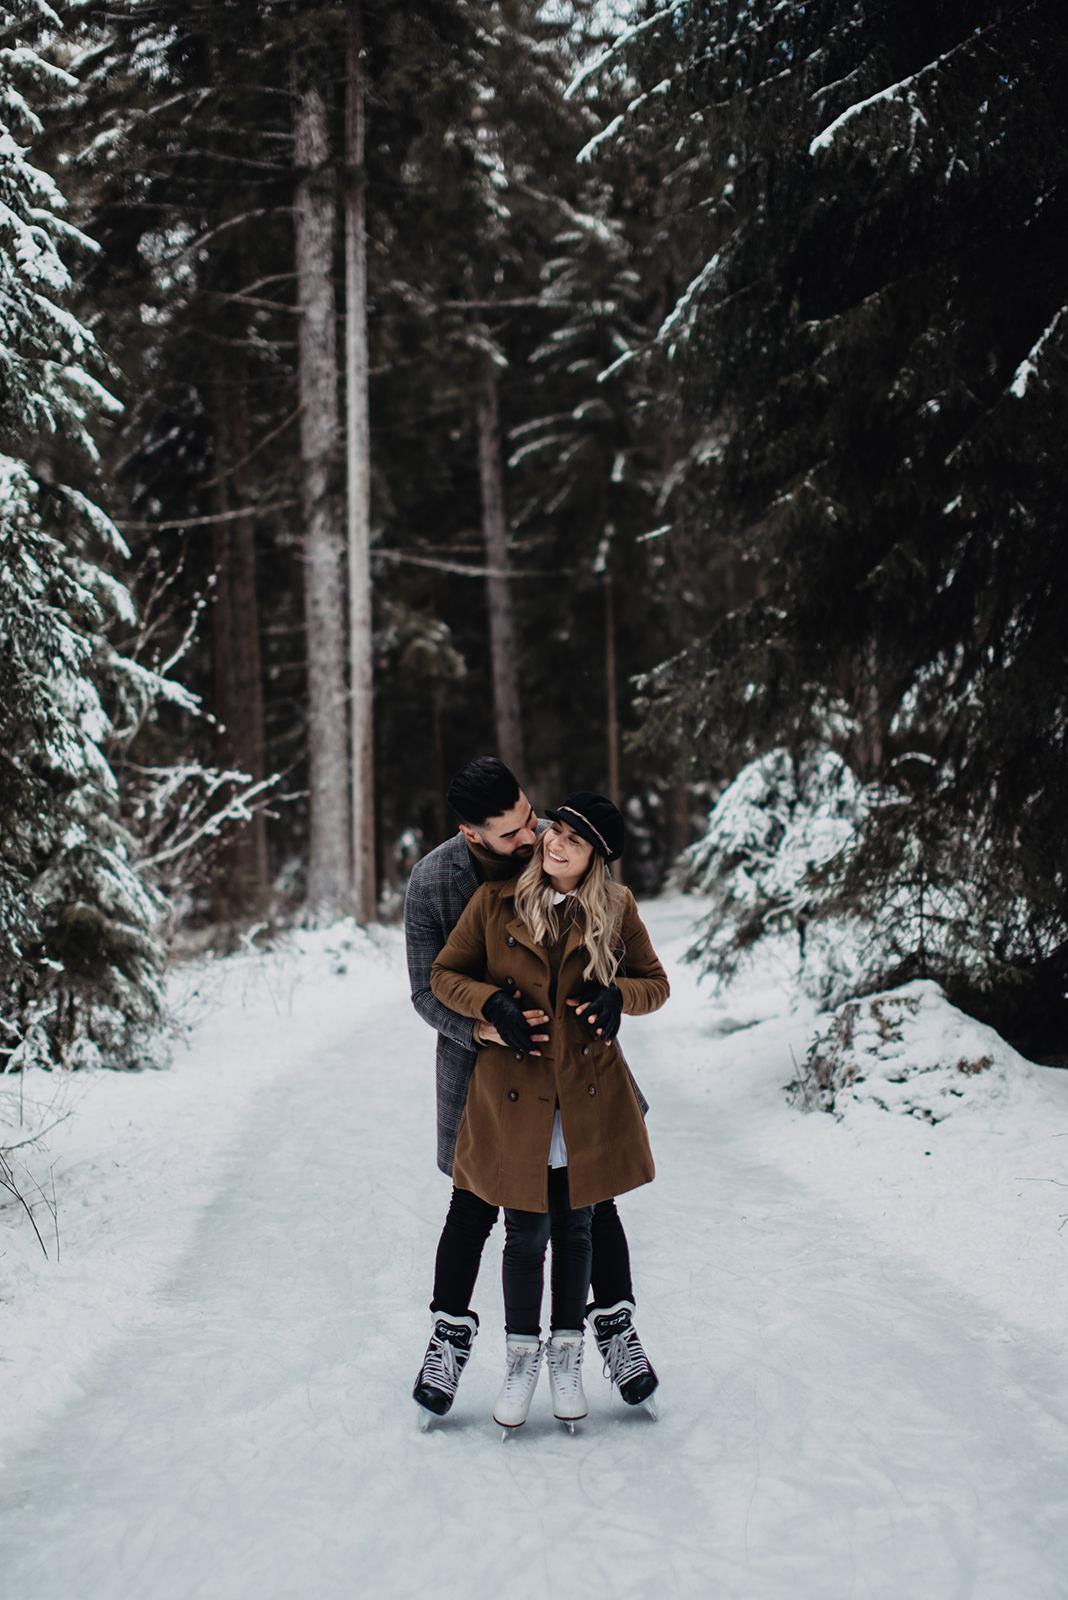 Winter Wonderland by Merve Tufan